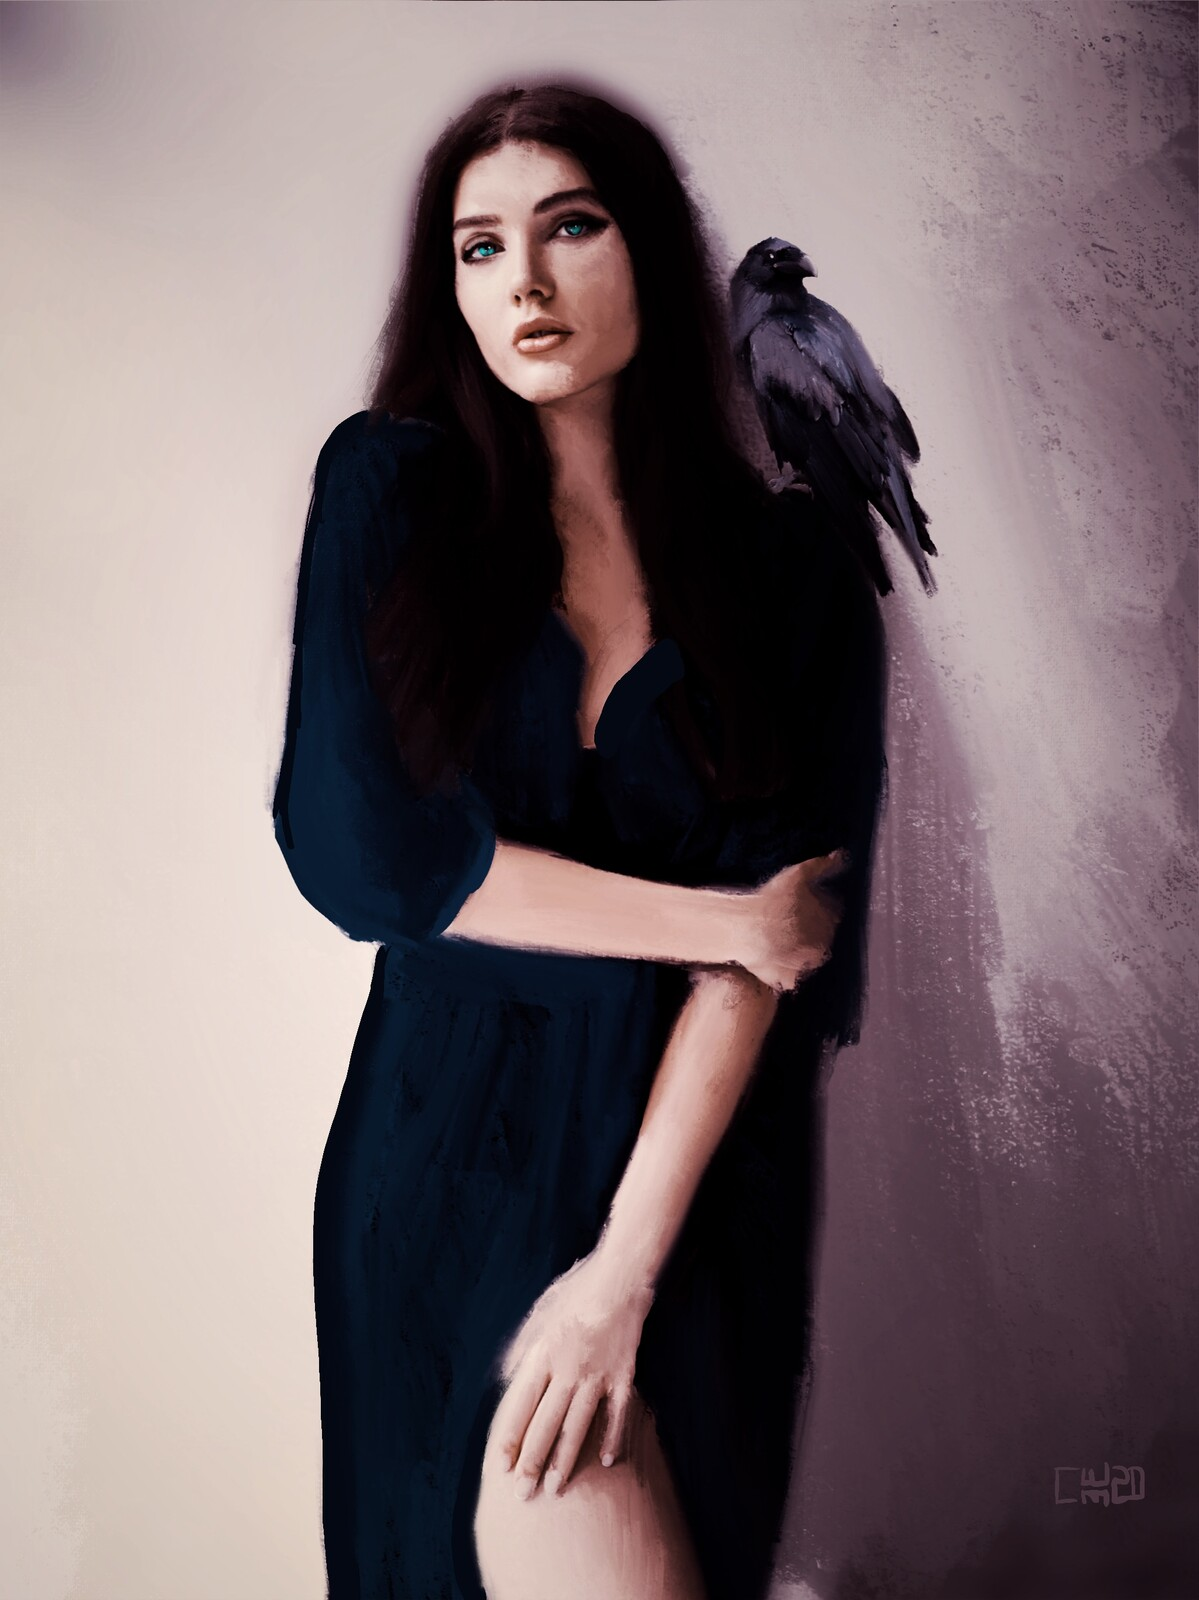 The Raven's Mistress